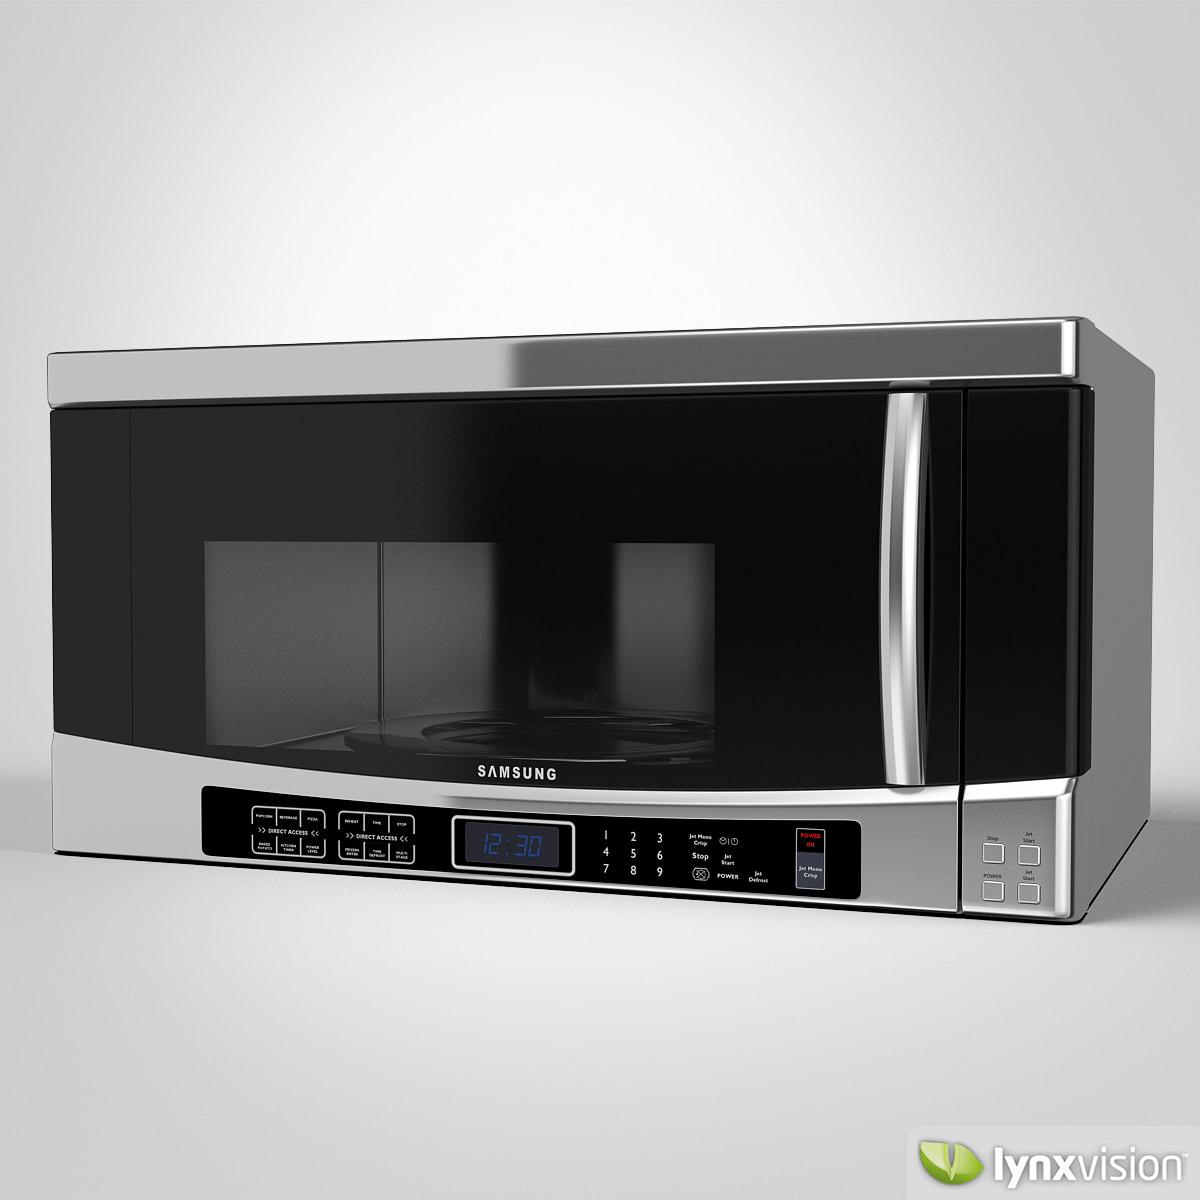 Samsung Microwave Model Max Obj Fbx Mtl 1